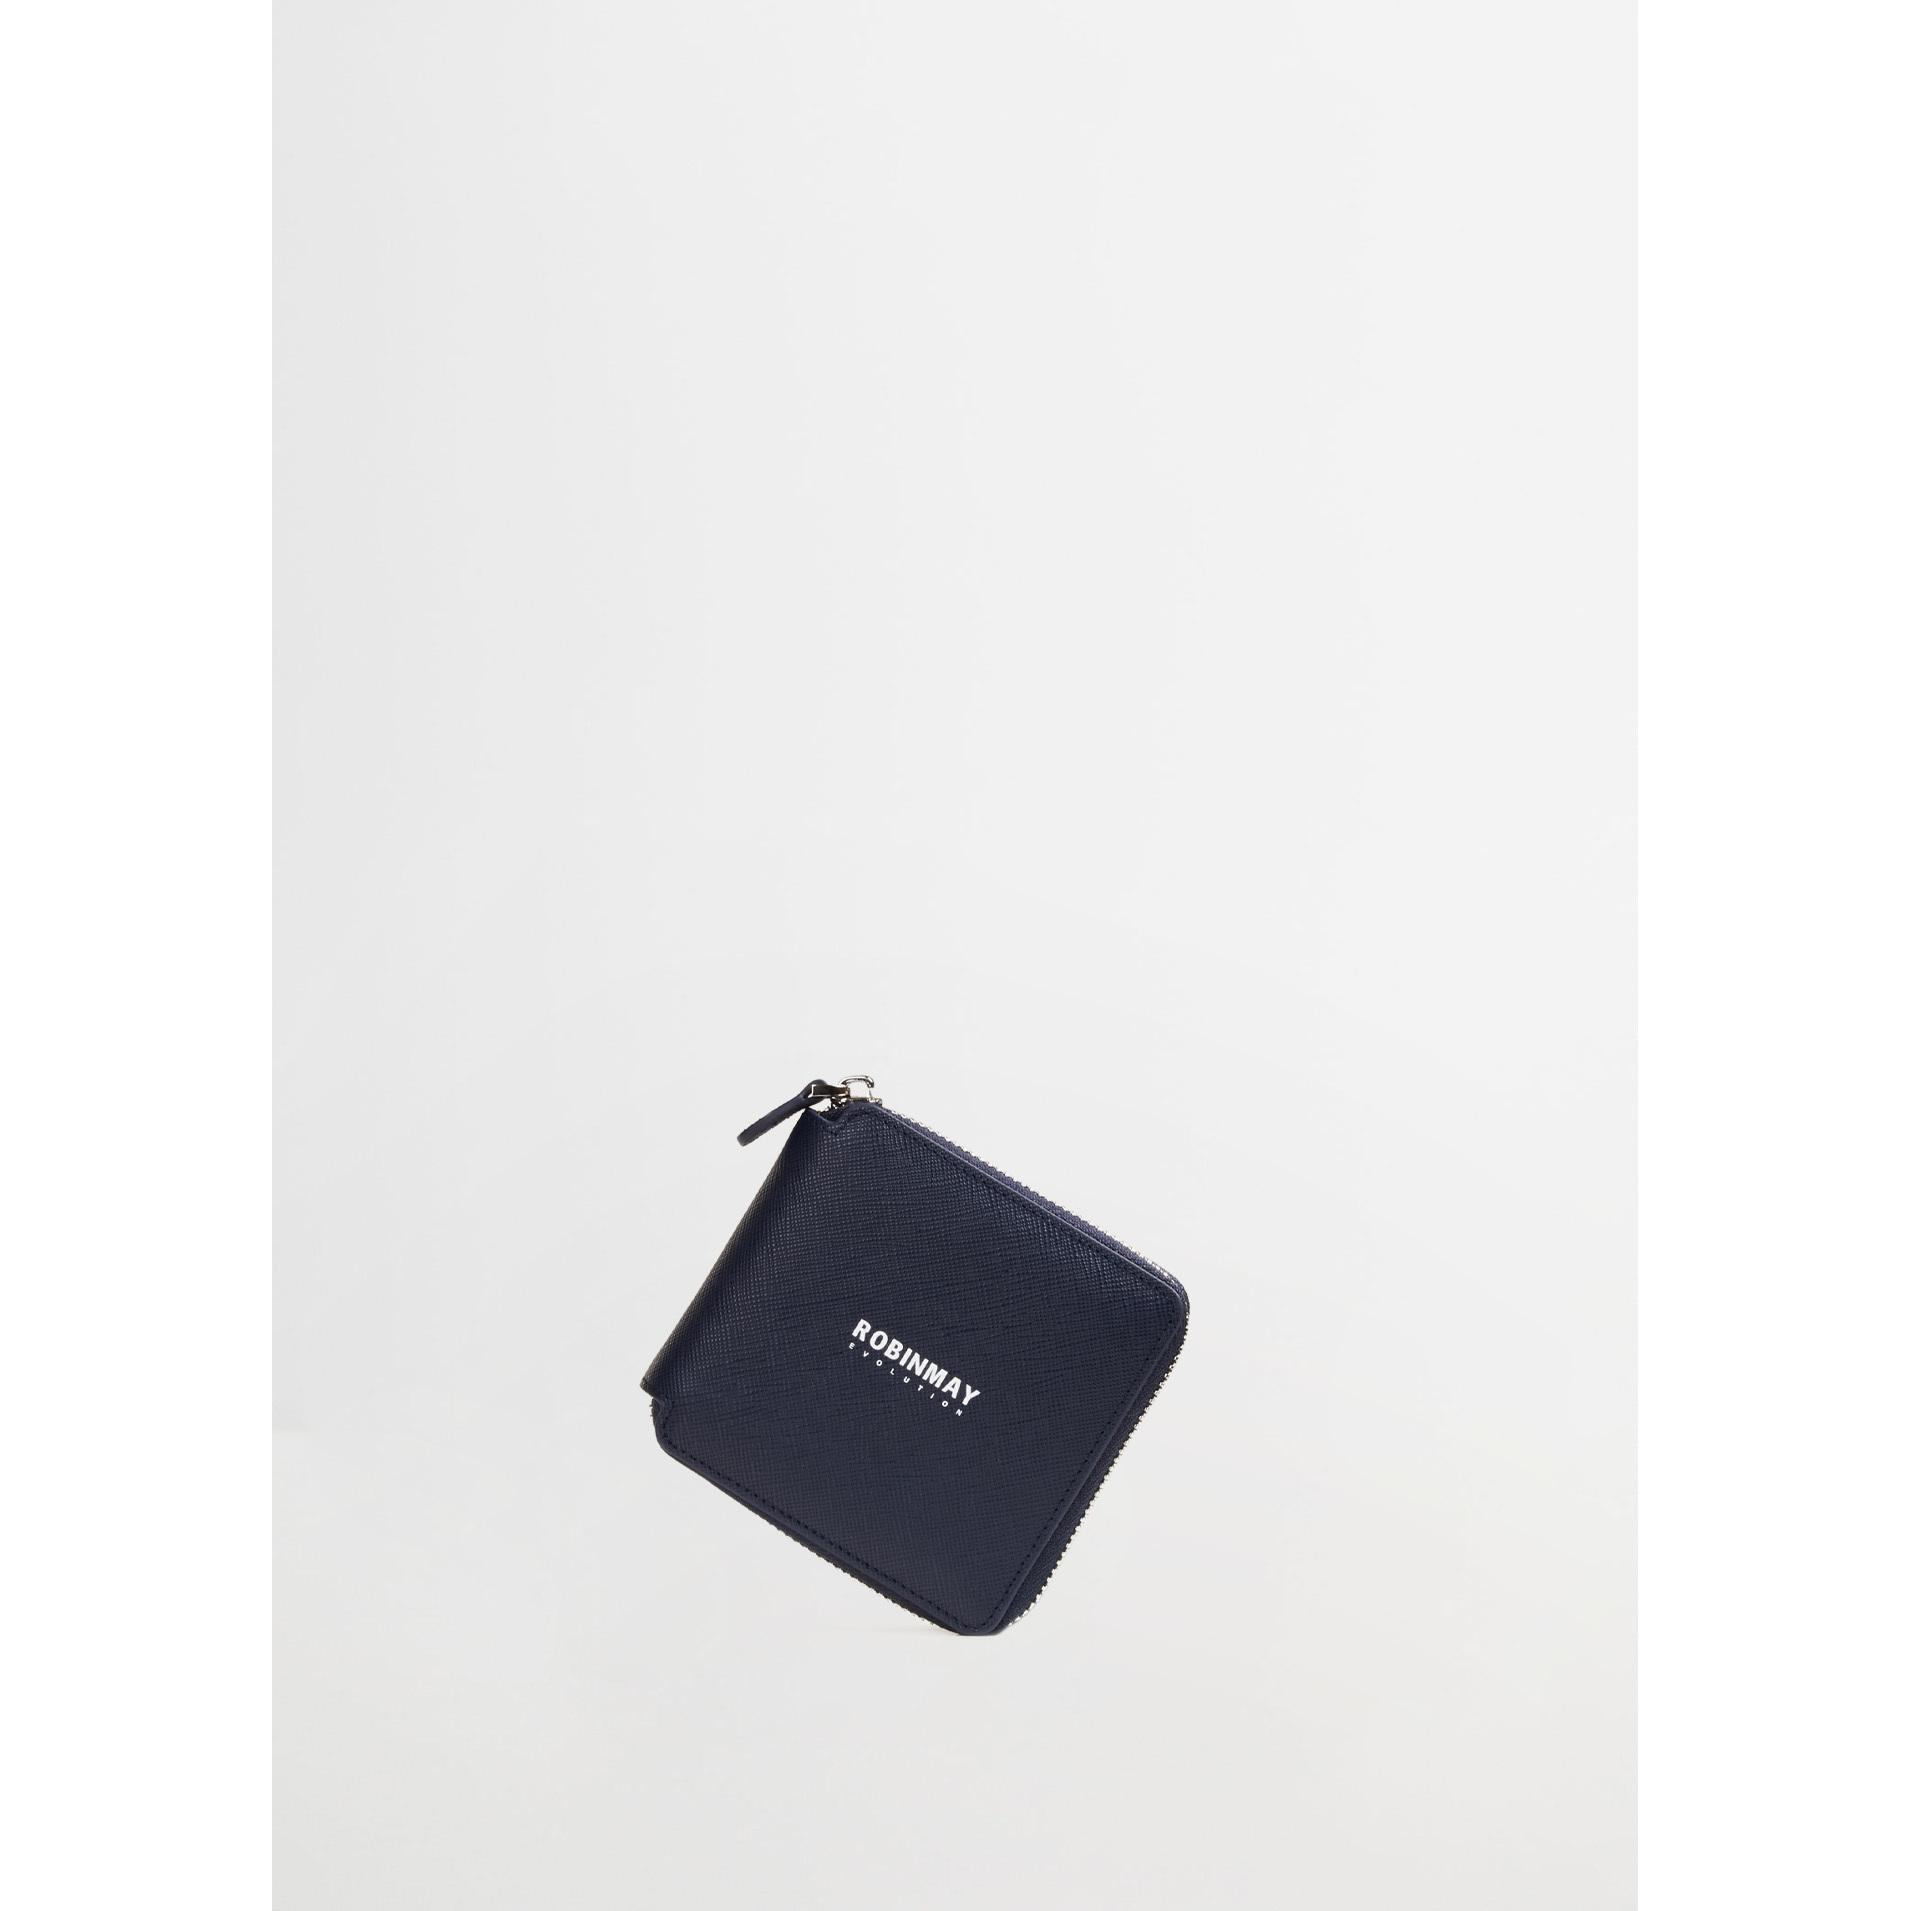 ROBINMAY品牌真皮方塊短夾